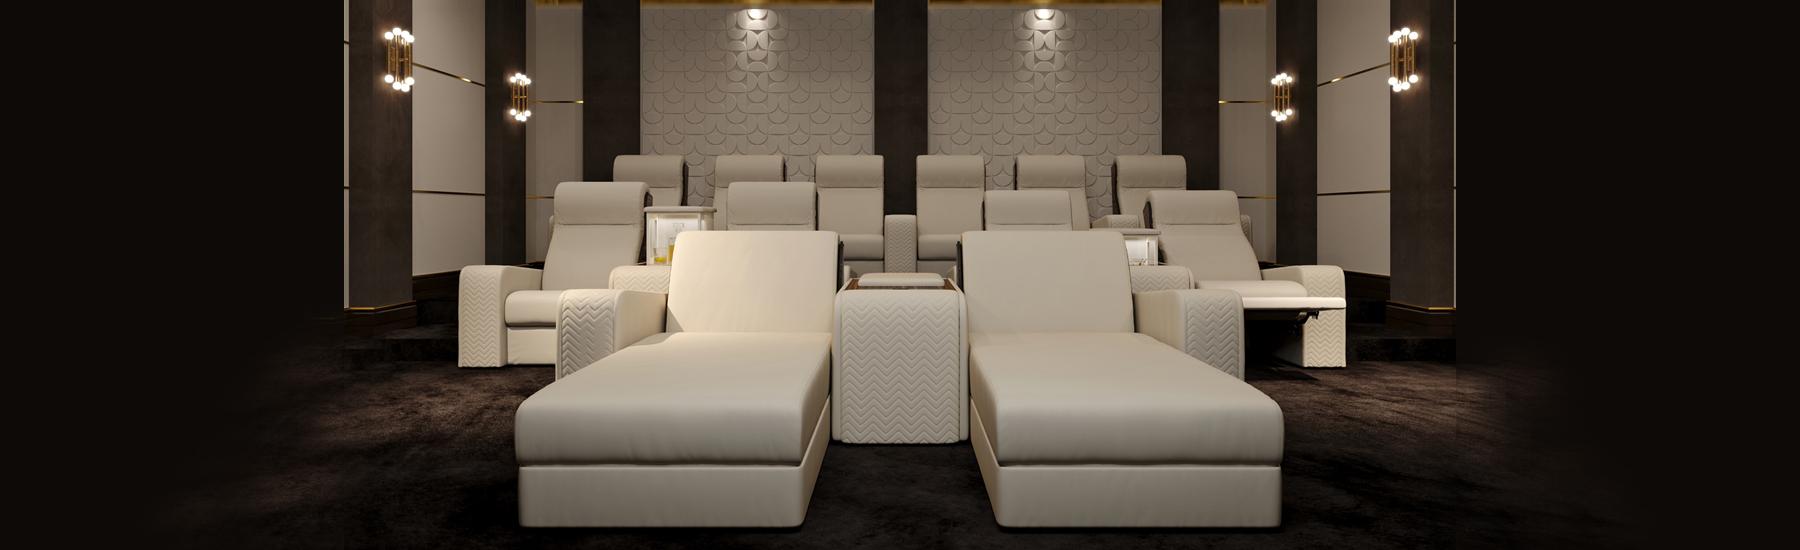 Onassis Home Cinema Seatings